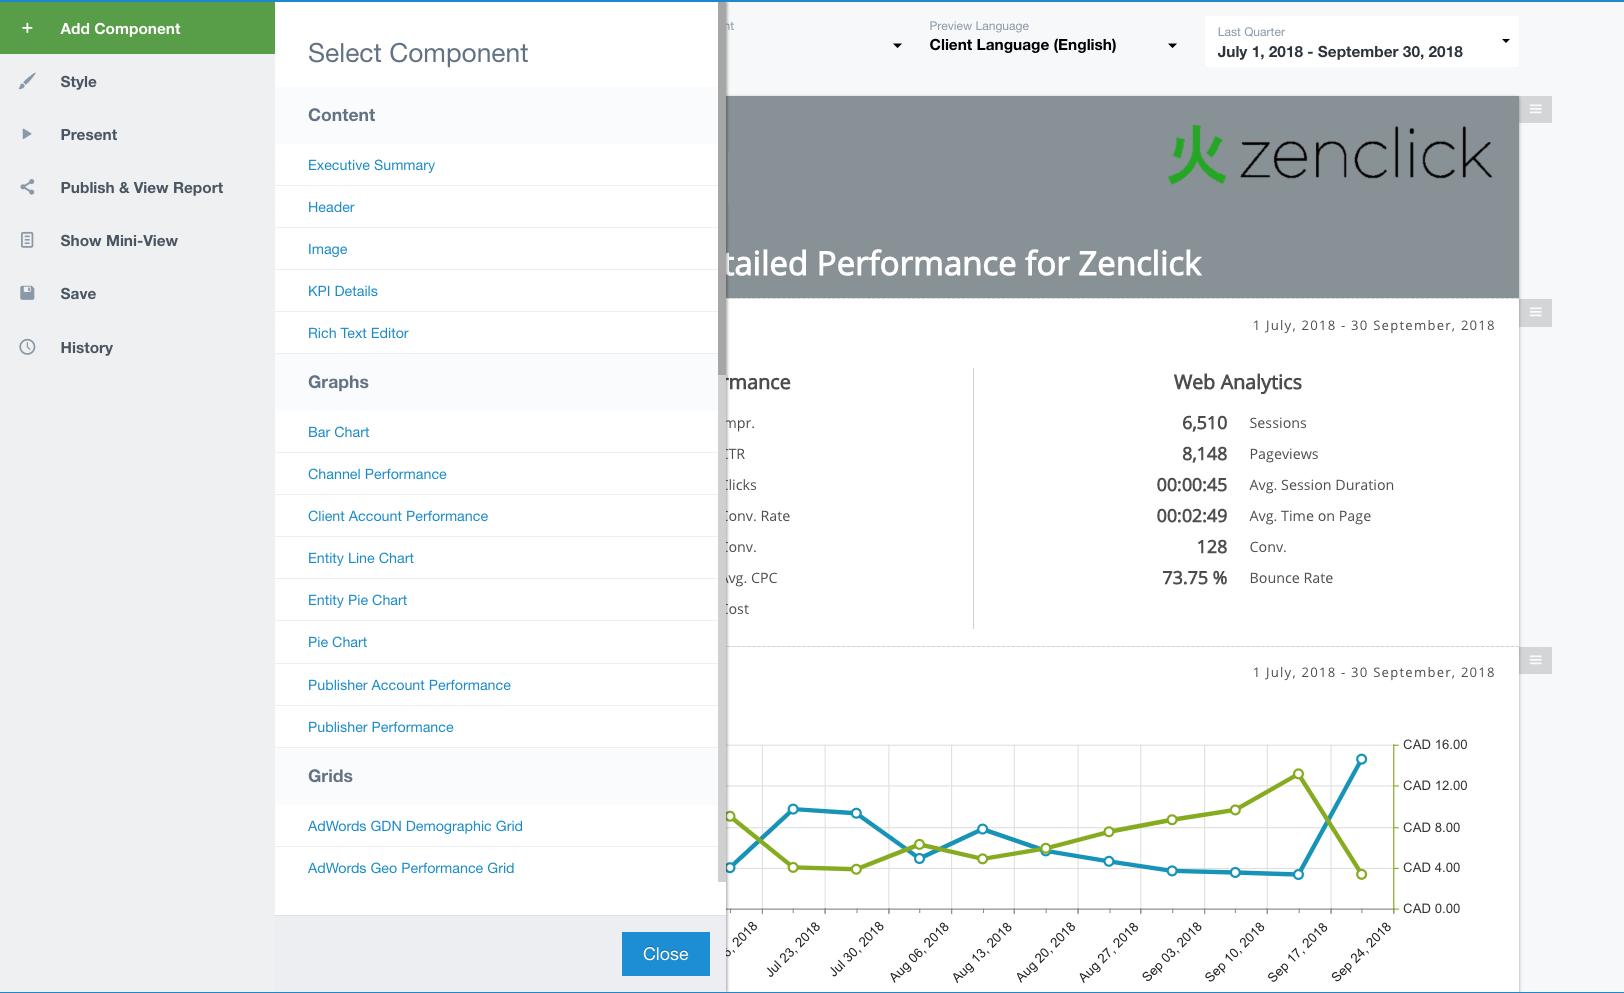 Pre-configured report templates